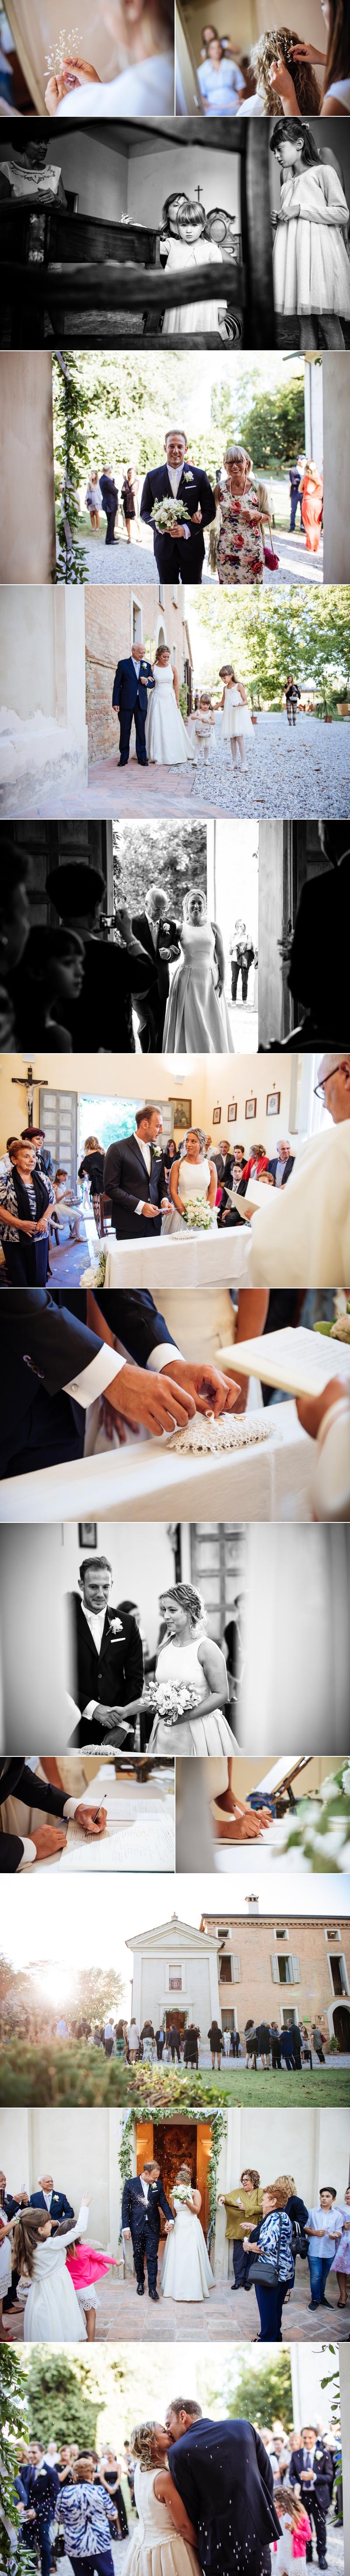 fotografo-matrimonio-forli-cesena-palazzo-baldini-bagnacavallo-ravenna2